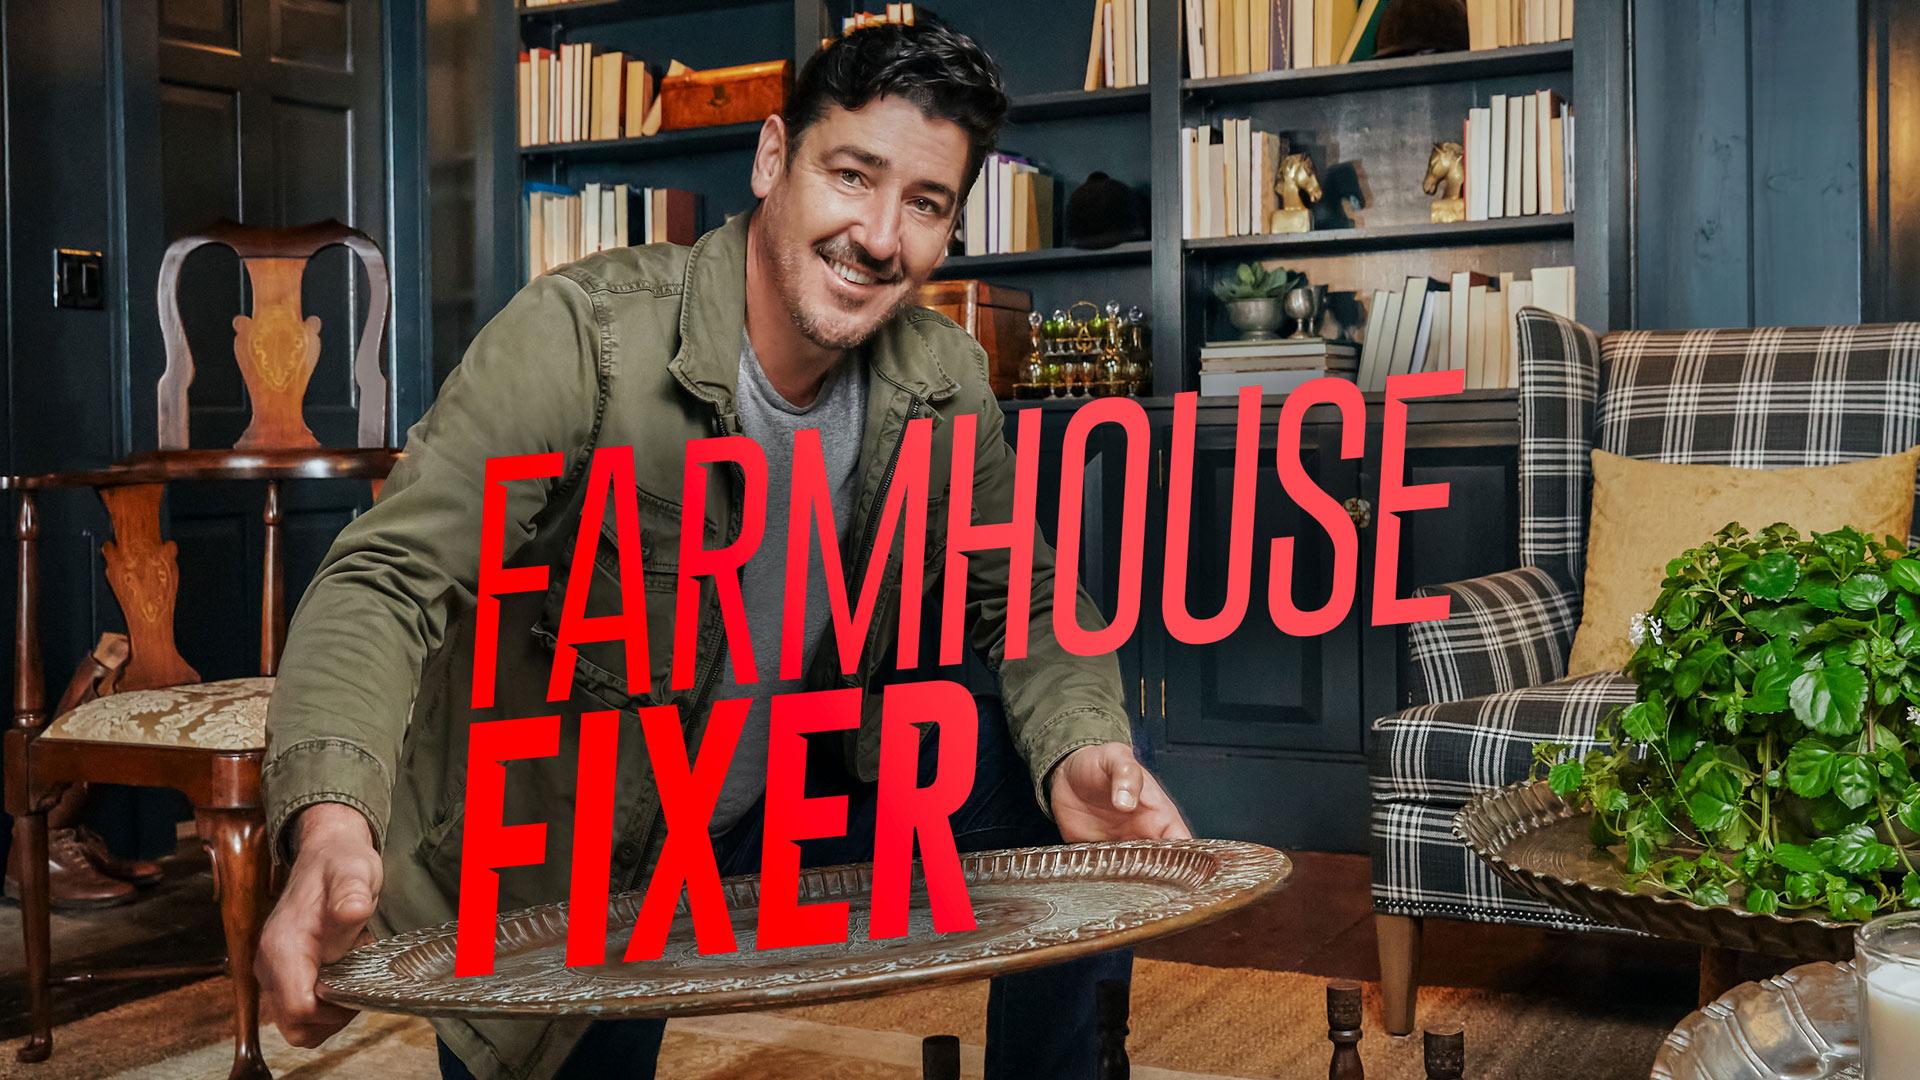 Farmhouse Fixer, Season 1